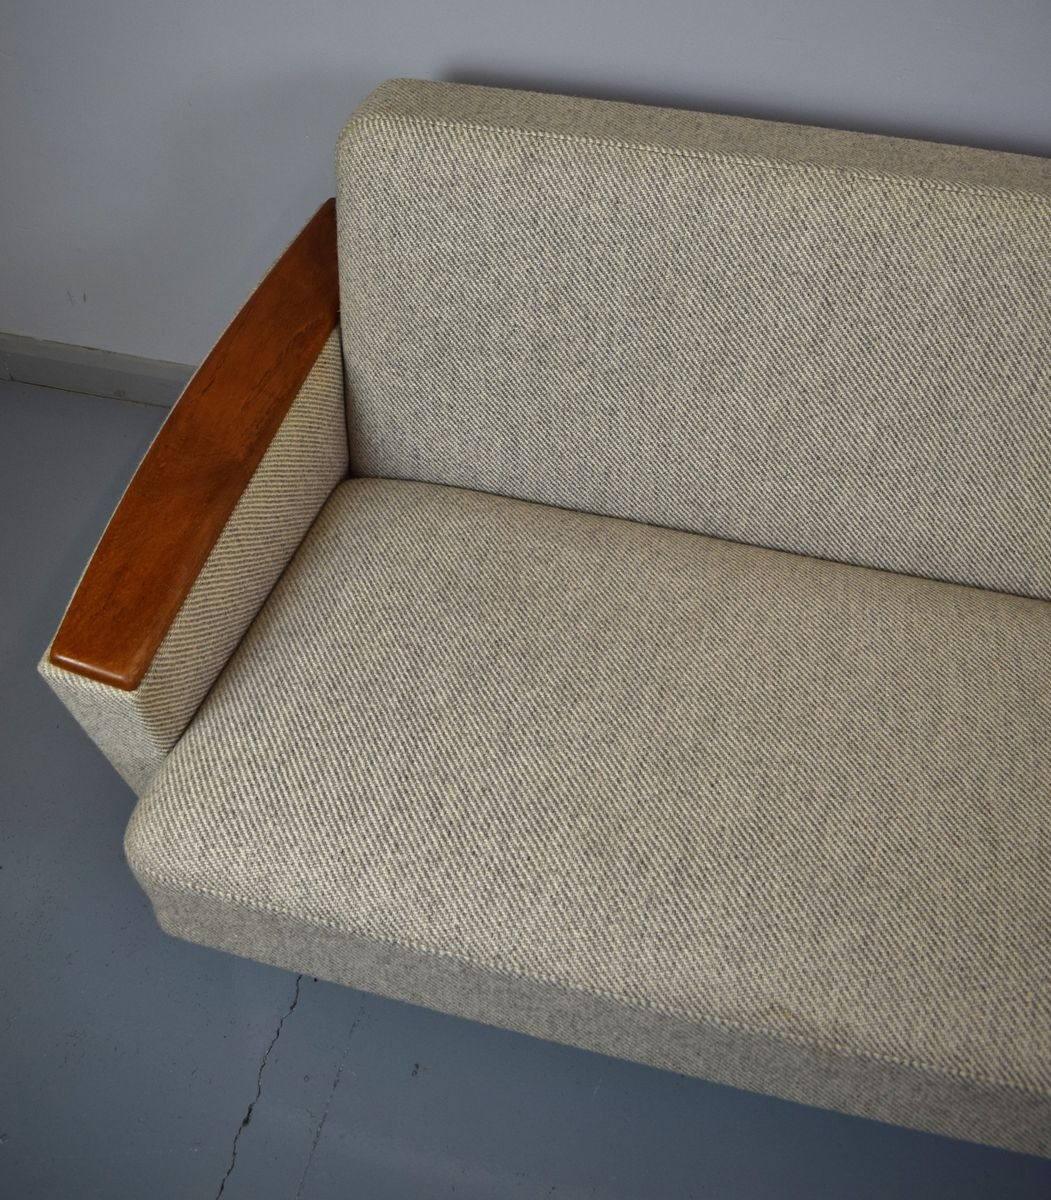 Mid century buchenholz 3 sitzer sofa bei pamono kaufen for Sofa 7 sitzer